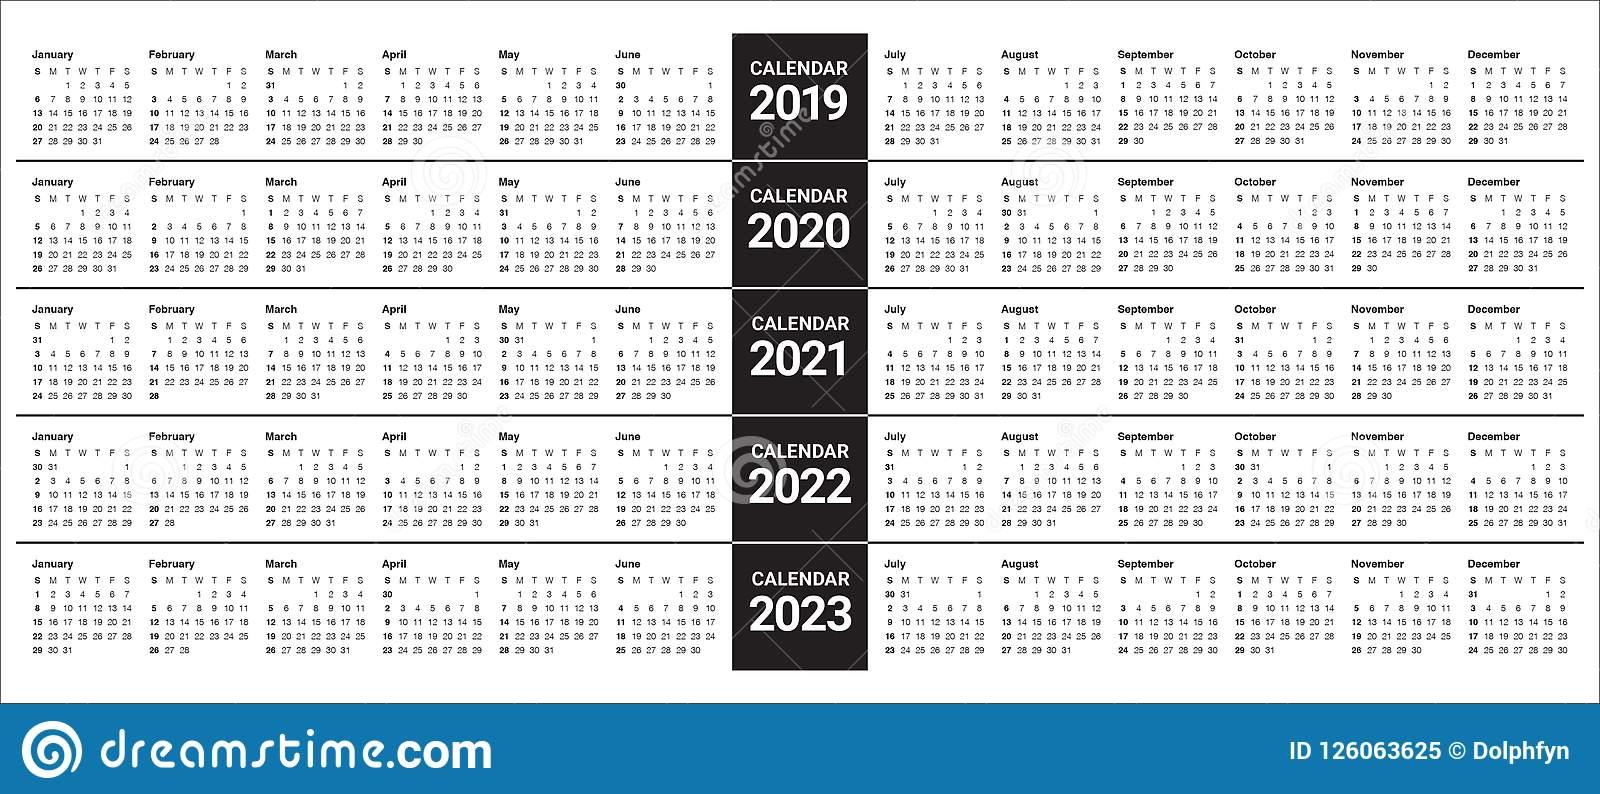 Year 2019 2020 2021 2022 2023 Calendar Vector Design intended for 4 5 4 Retail Calendar 2022 2023